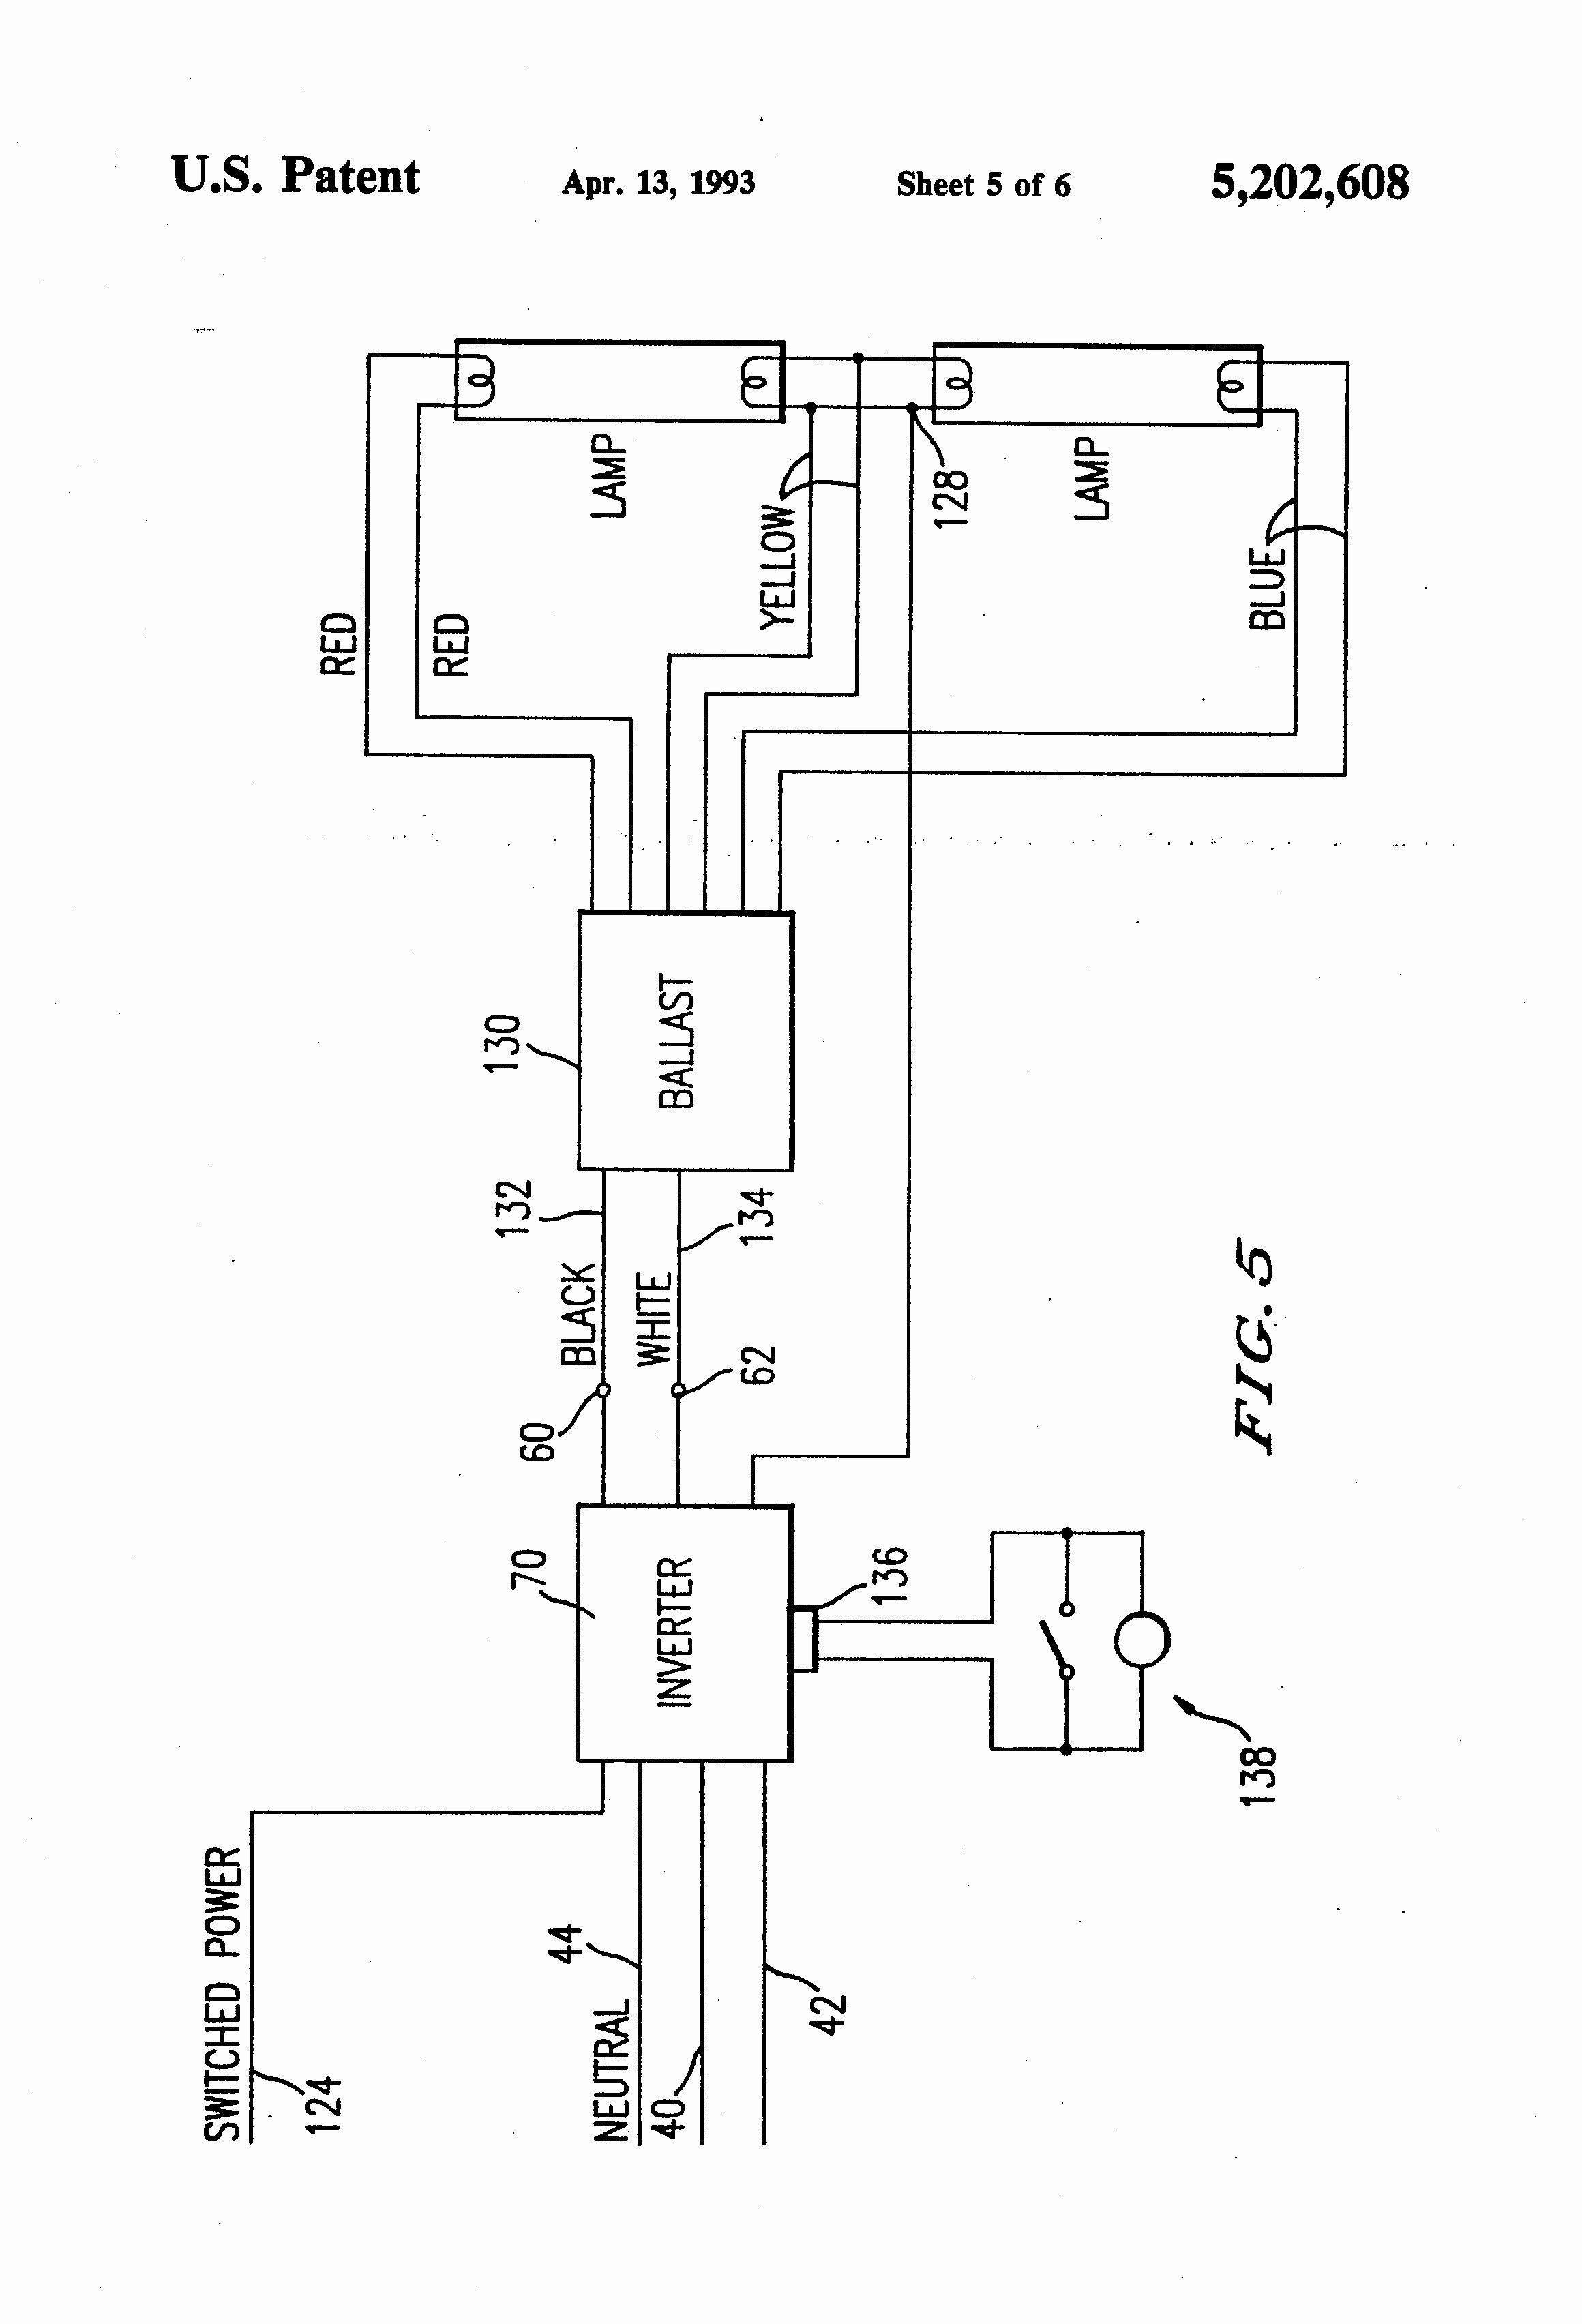 [DIAGRAM_4PO]  19 Stunning Free Auto Wiring Diagrams For You ,  https://bacamajalah.com/19-stunning-free-auto-wiring-diagrams-for-you/ … |  Ballast, Led tubes, Honeywell thermostats | Free Automotive Wiring Diagrams |  | Pinterest